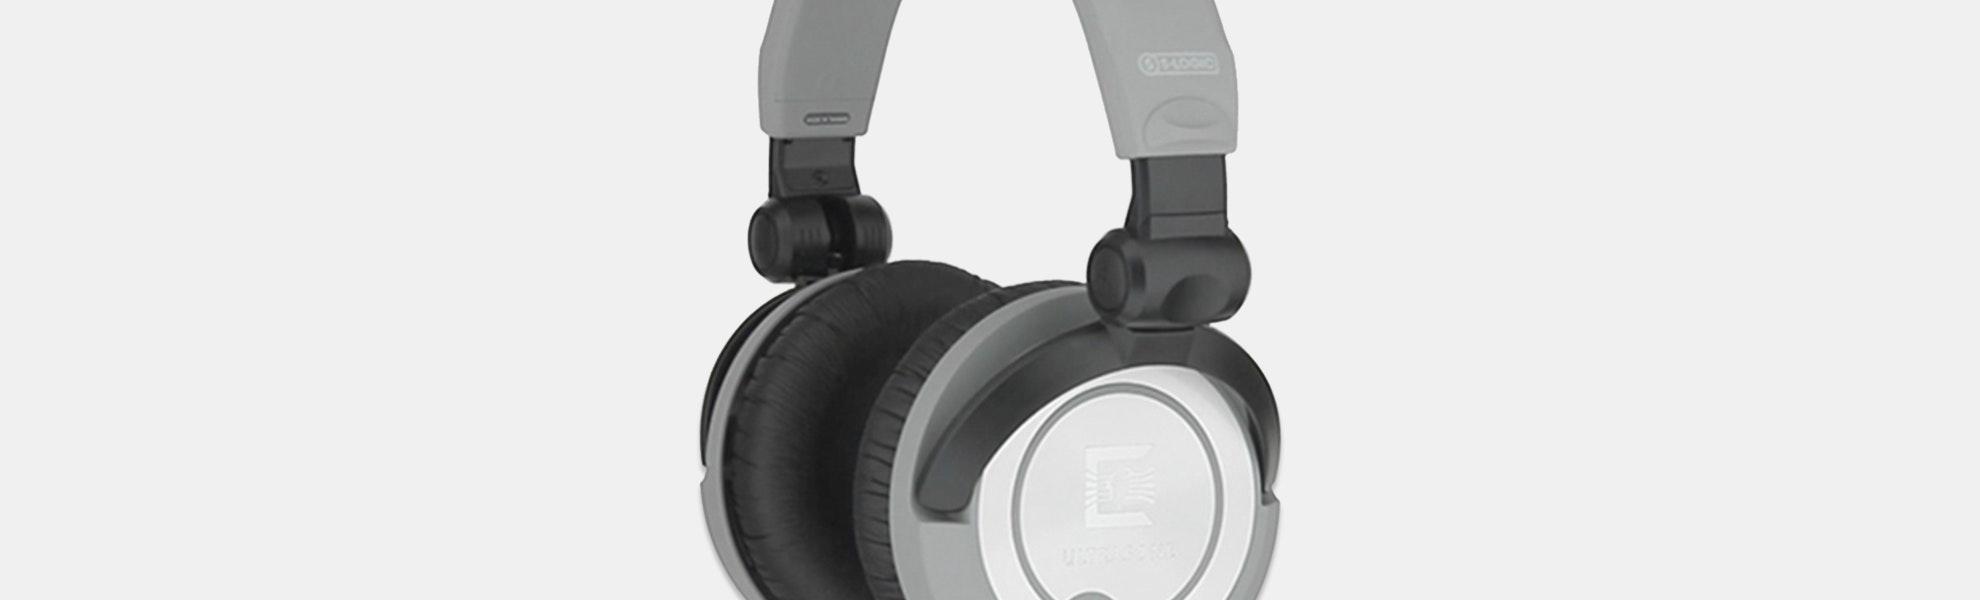 Ultrasone Pro 550i Headphones